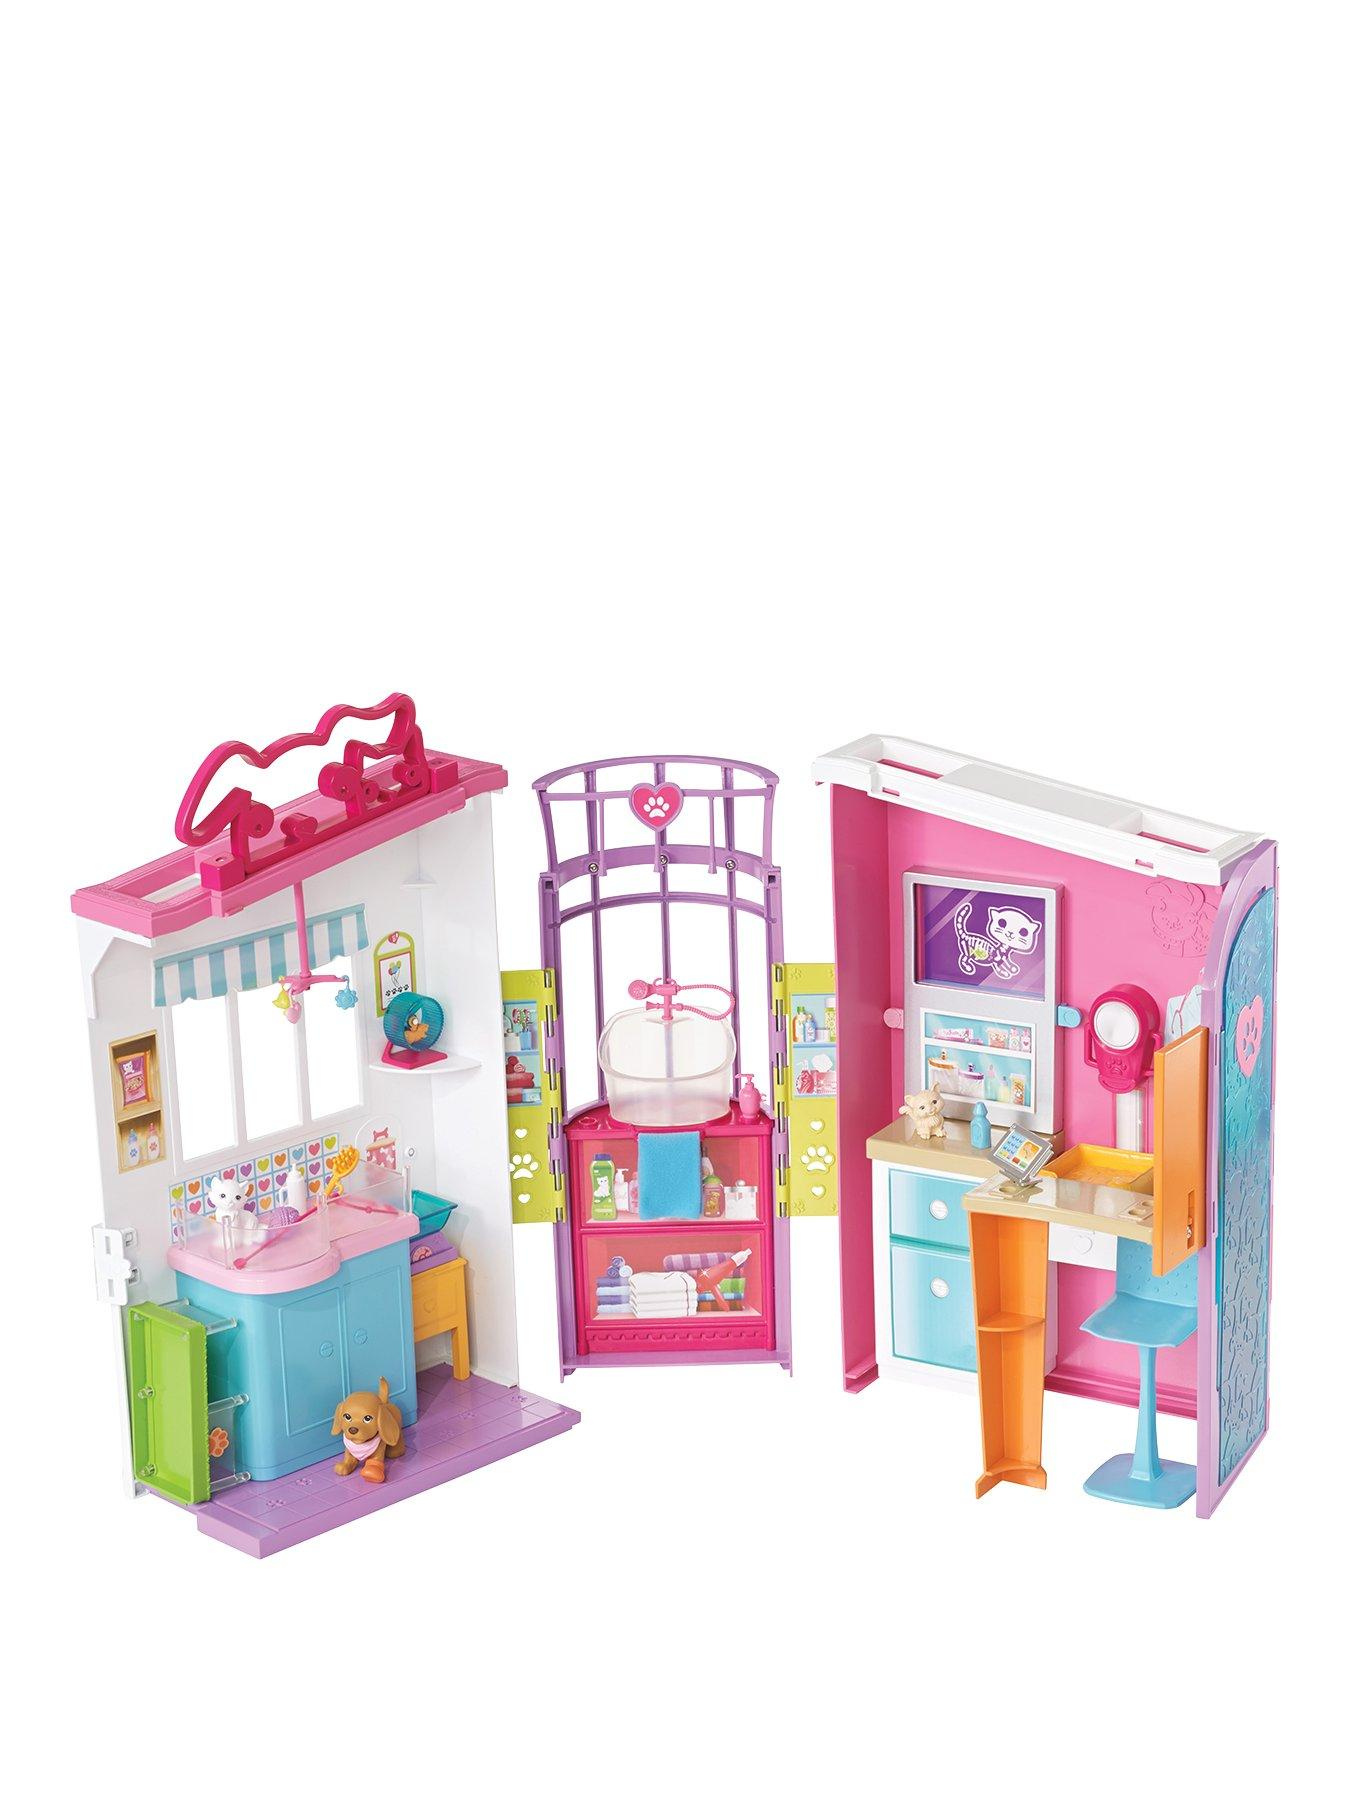 Compare prices for Barbie Pet Care Centre